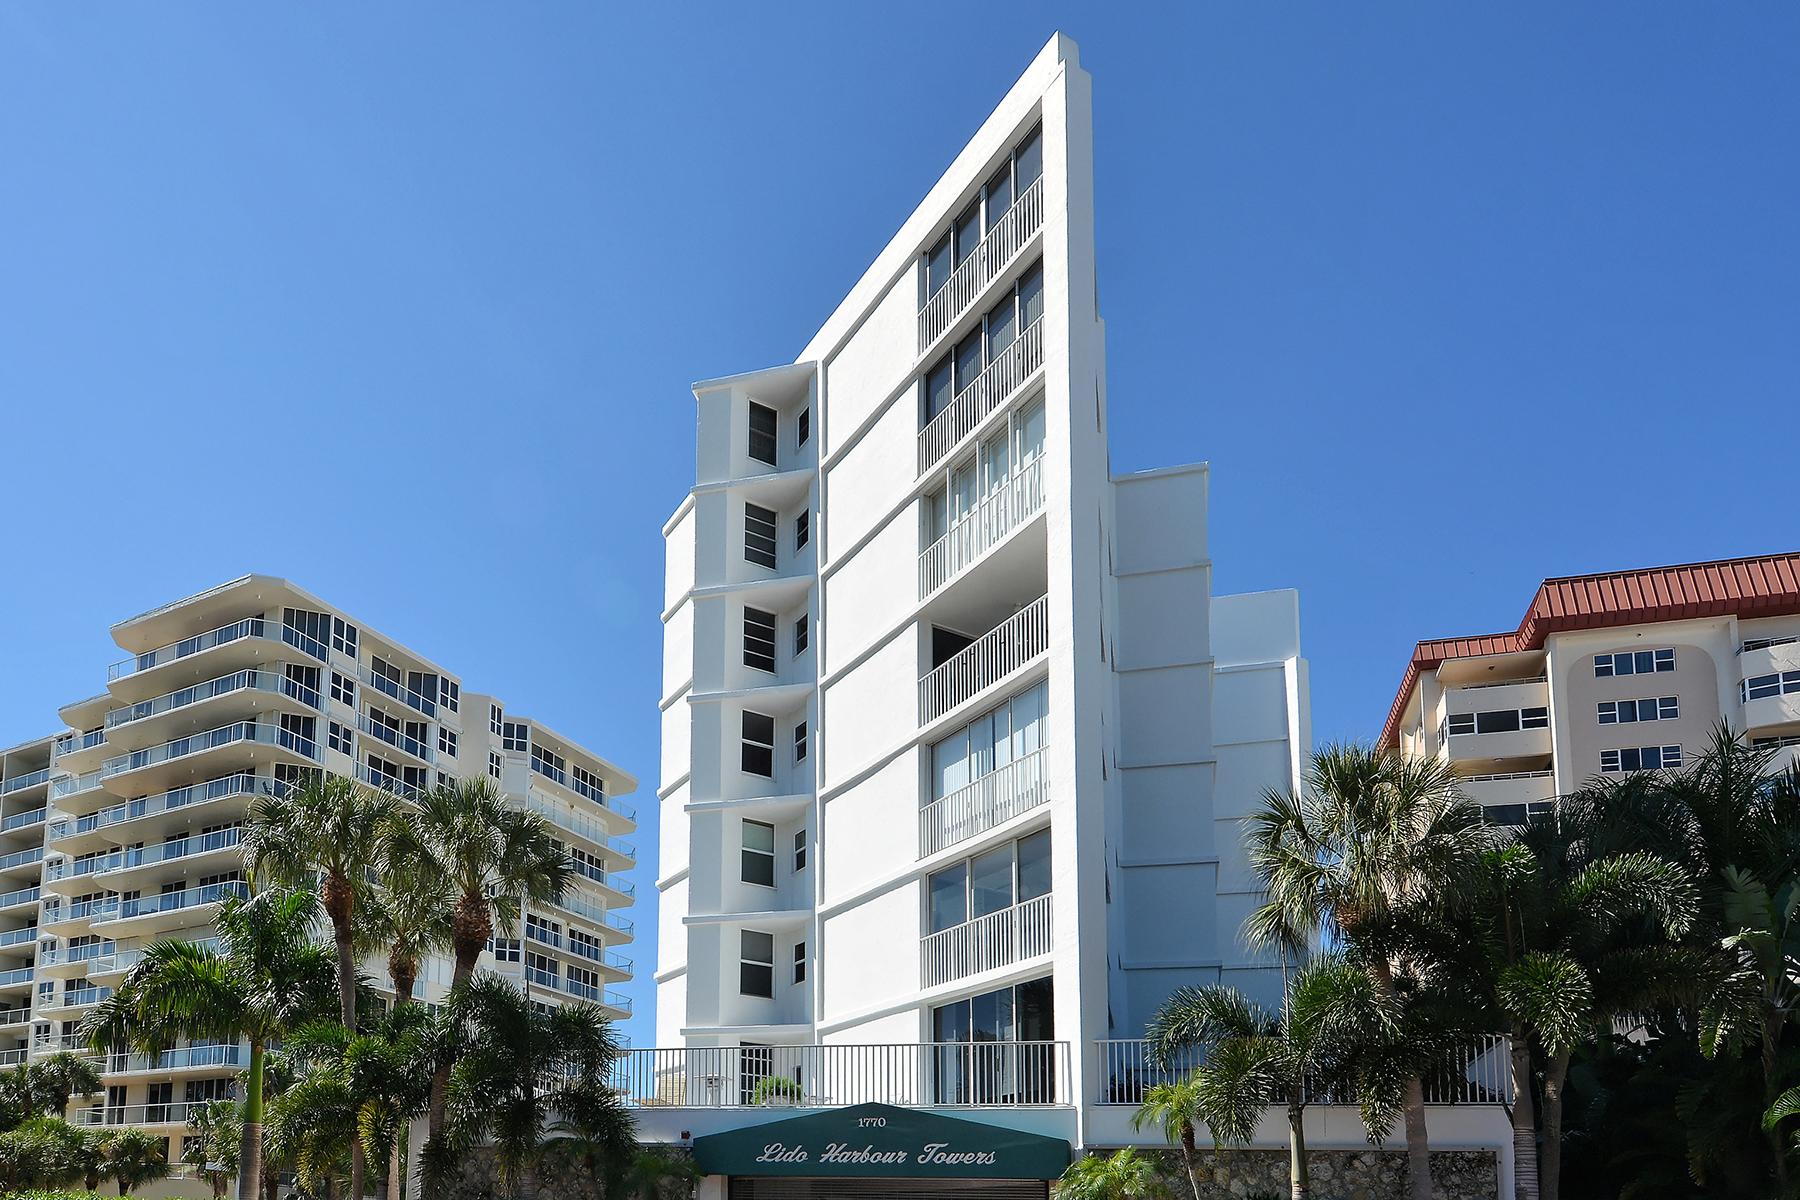 共管物業 為 出售 在 SARASOTA 1770 Benjamin Franklin Dr 407 Sarasota, 佛羅里達州, 34236 美國